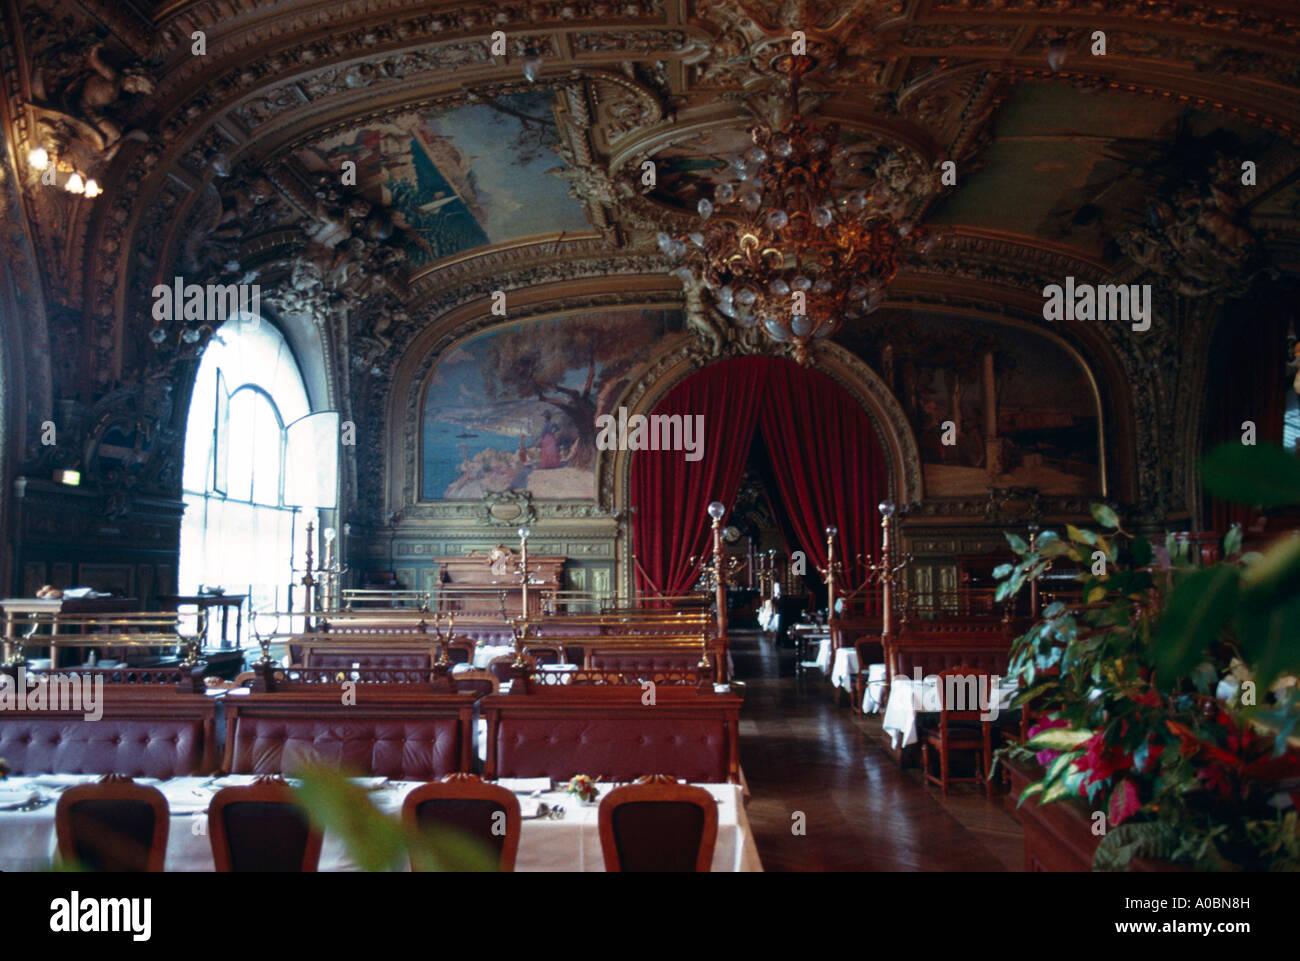 El restaurante Le Train Bleu Interieur Paris Foto de stock